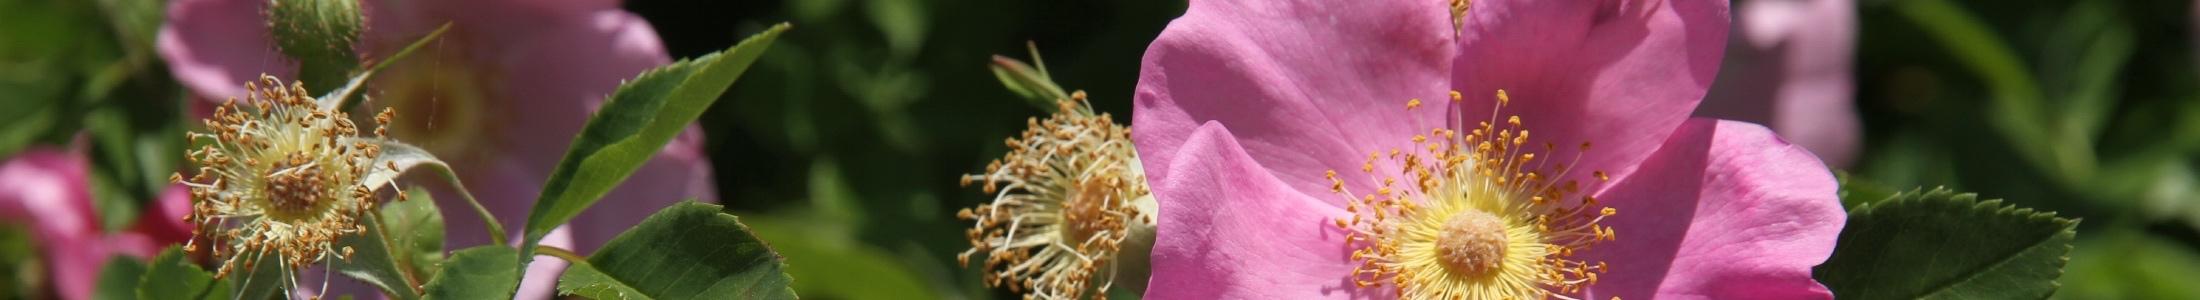 Wildrose (Foto: Markus Breier)